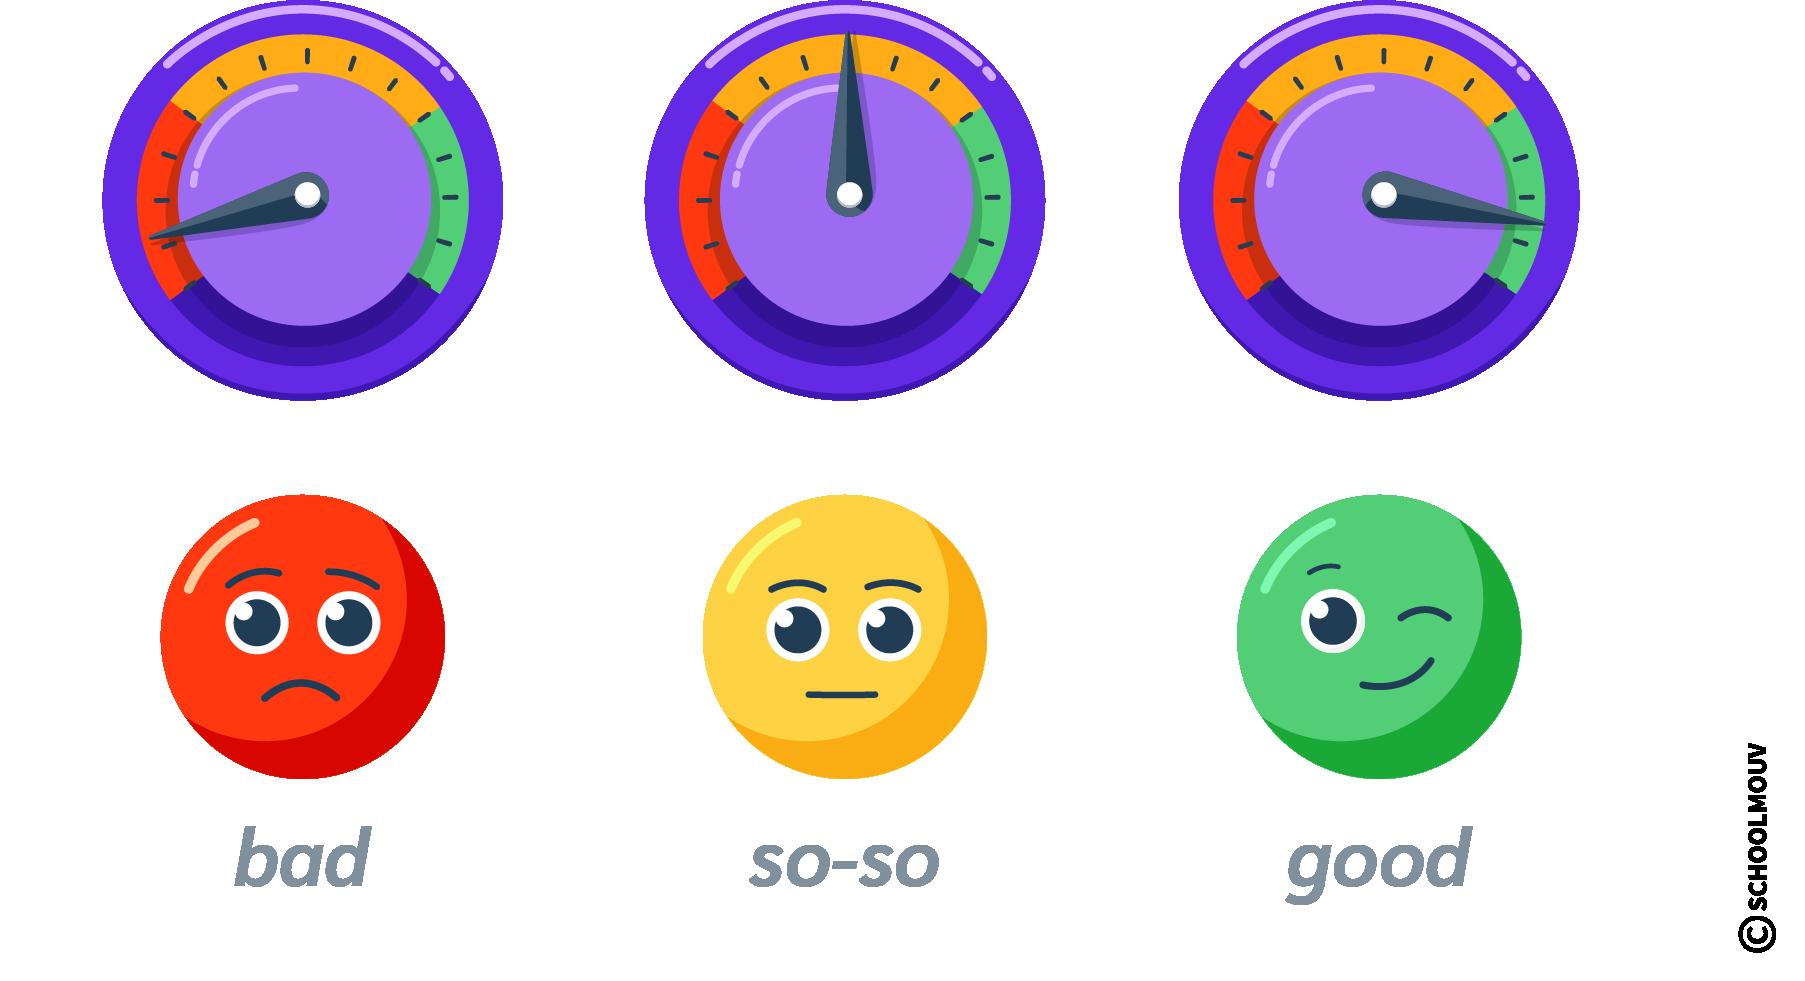 anglais emotions bad good so-so